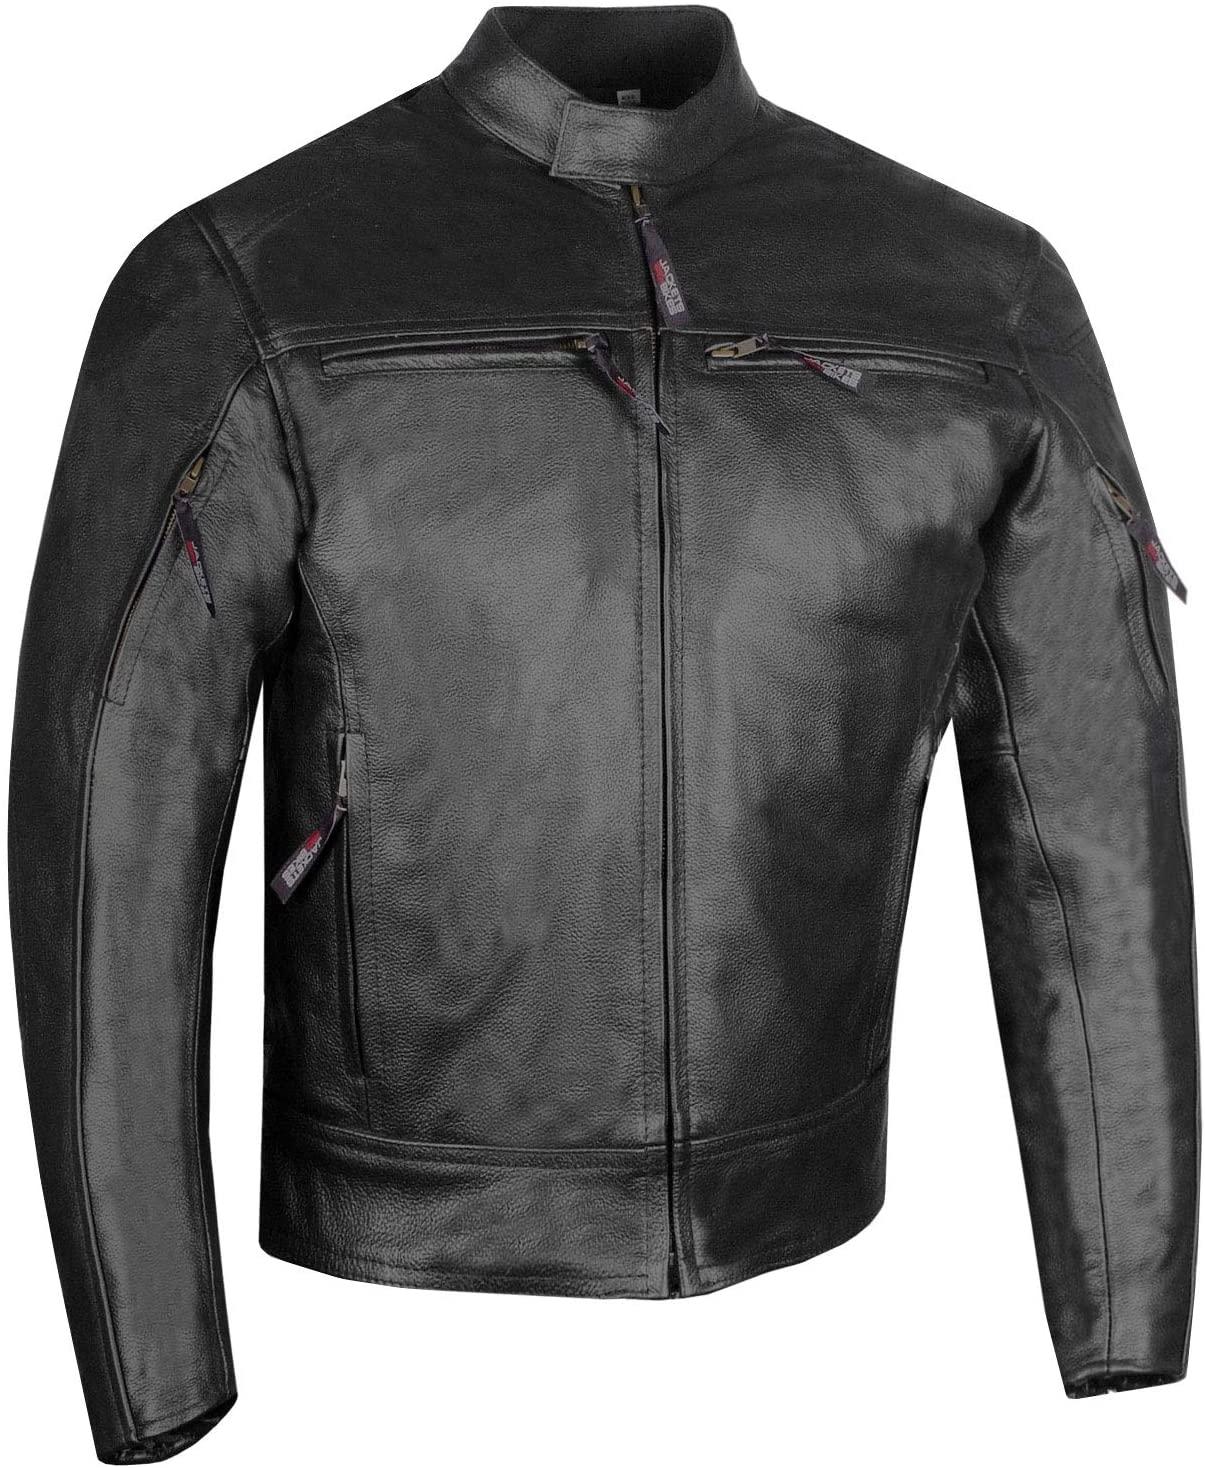 Men's Raider Premium Natural Buffalo Leather Motorcycle Armor Biker Jacket M